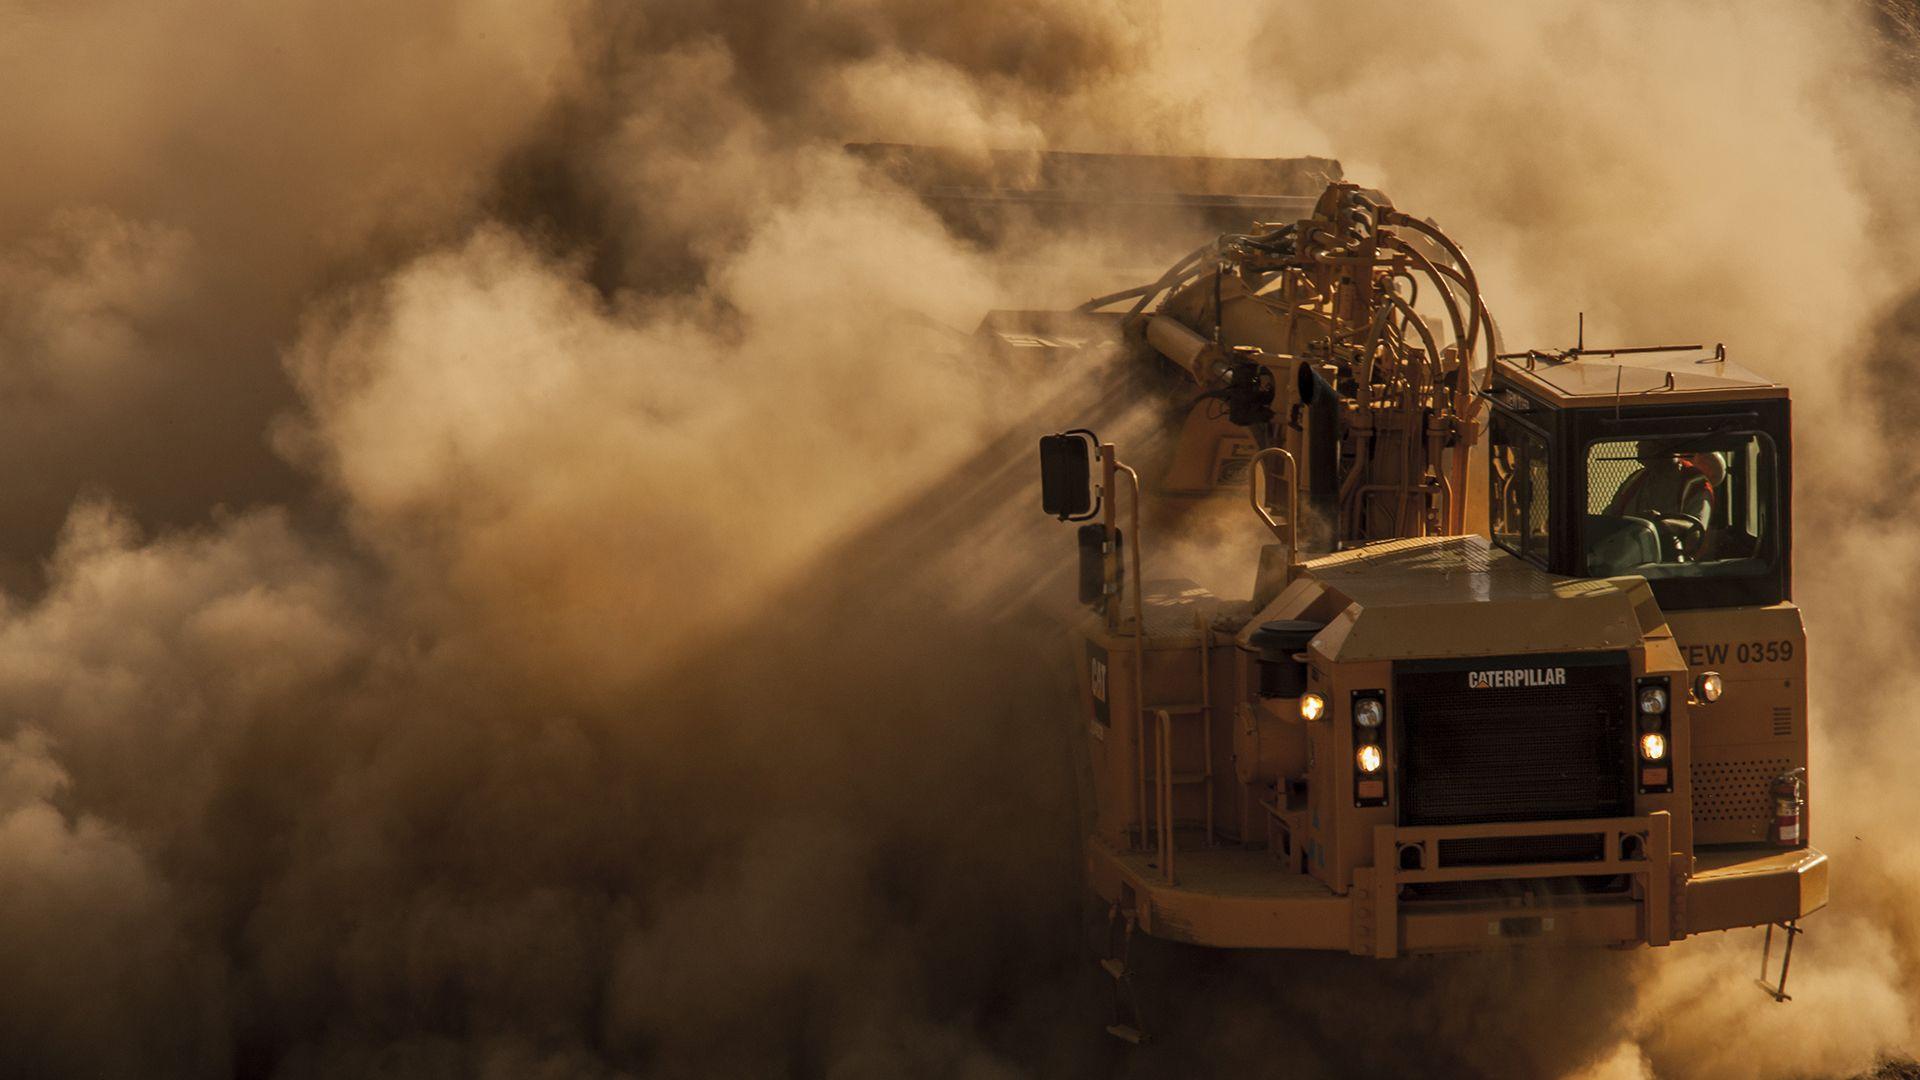 Truck in Dirt